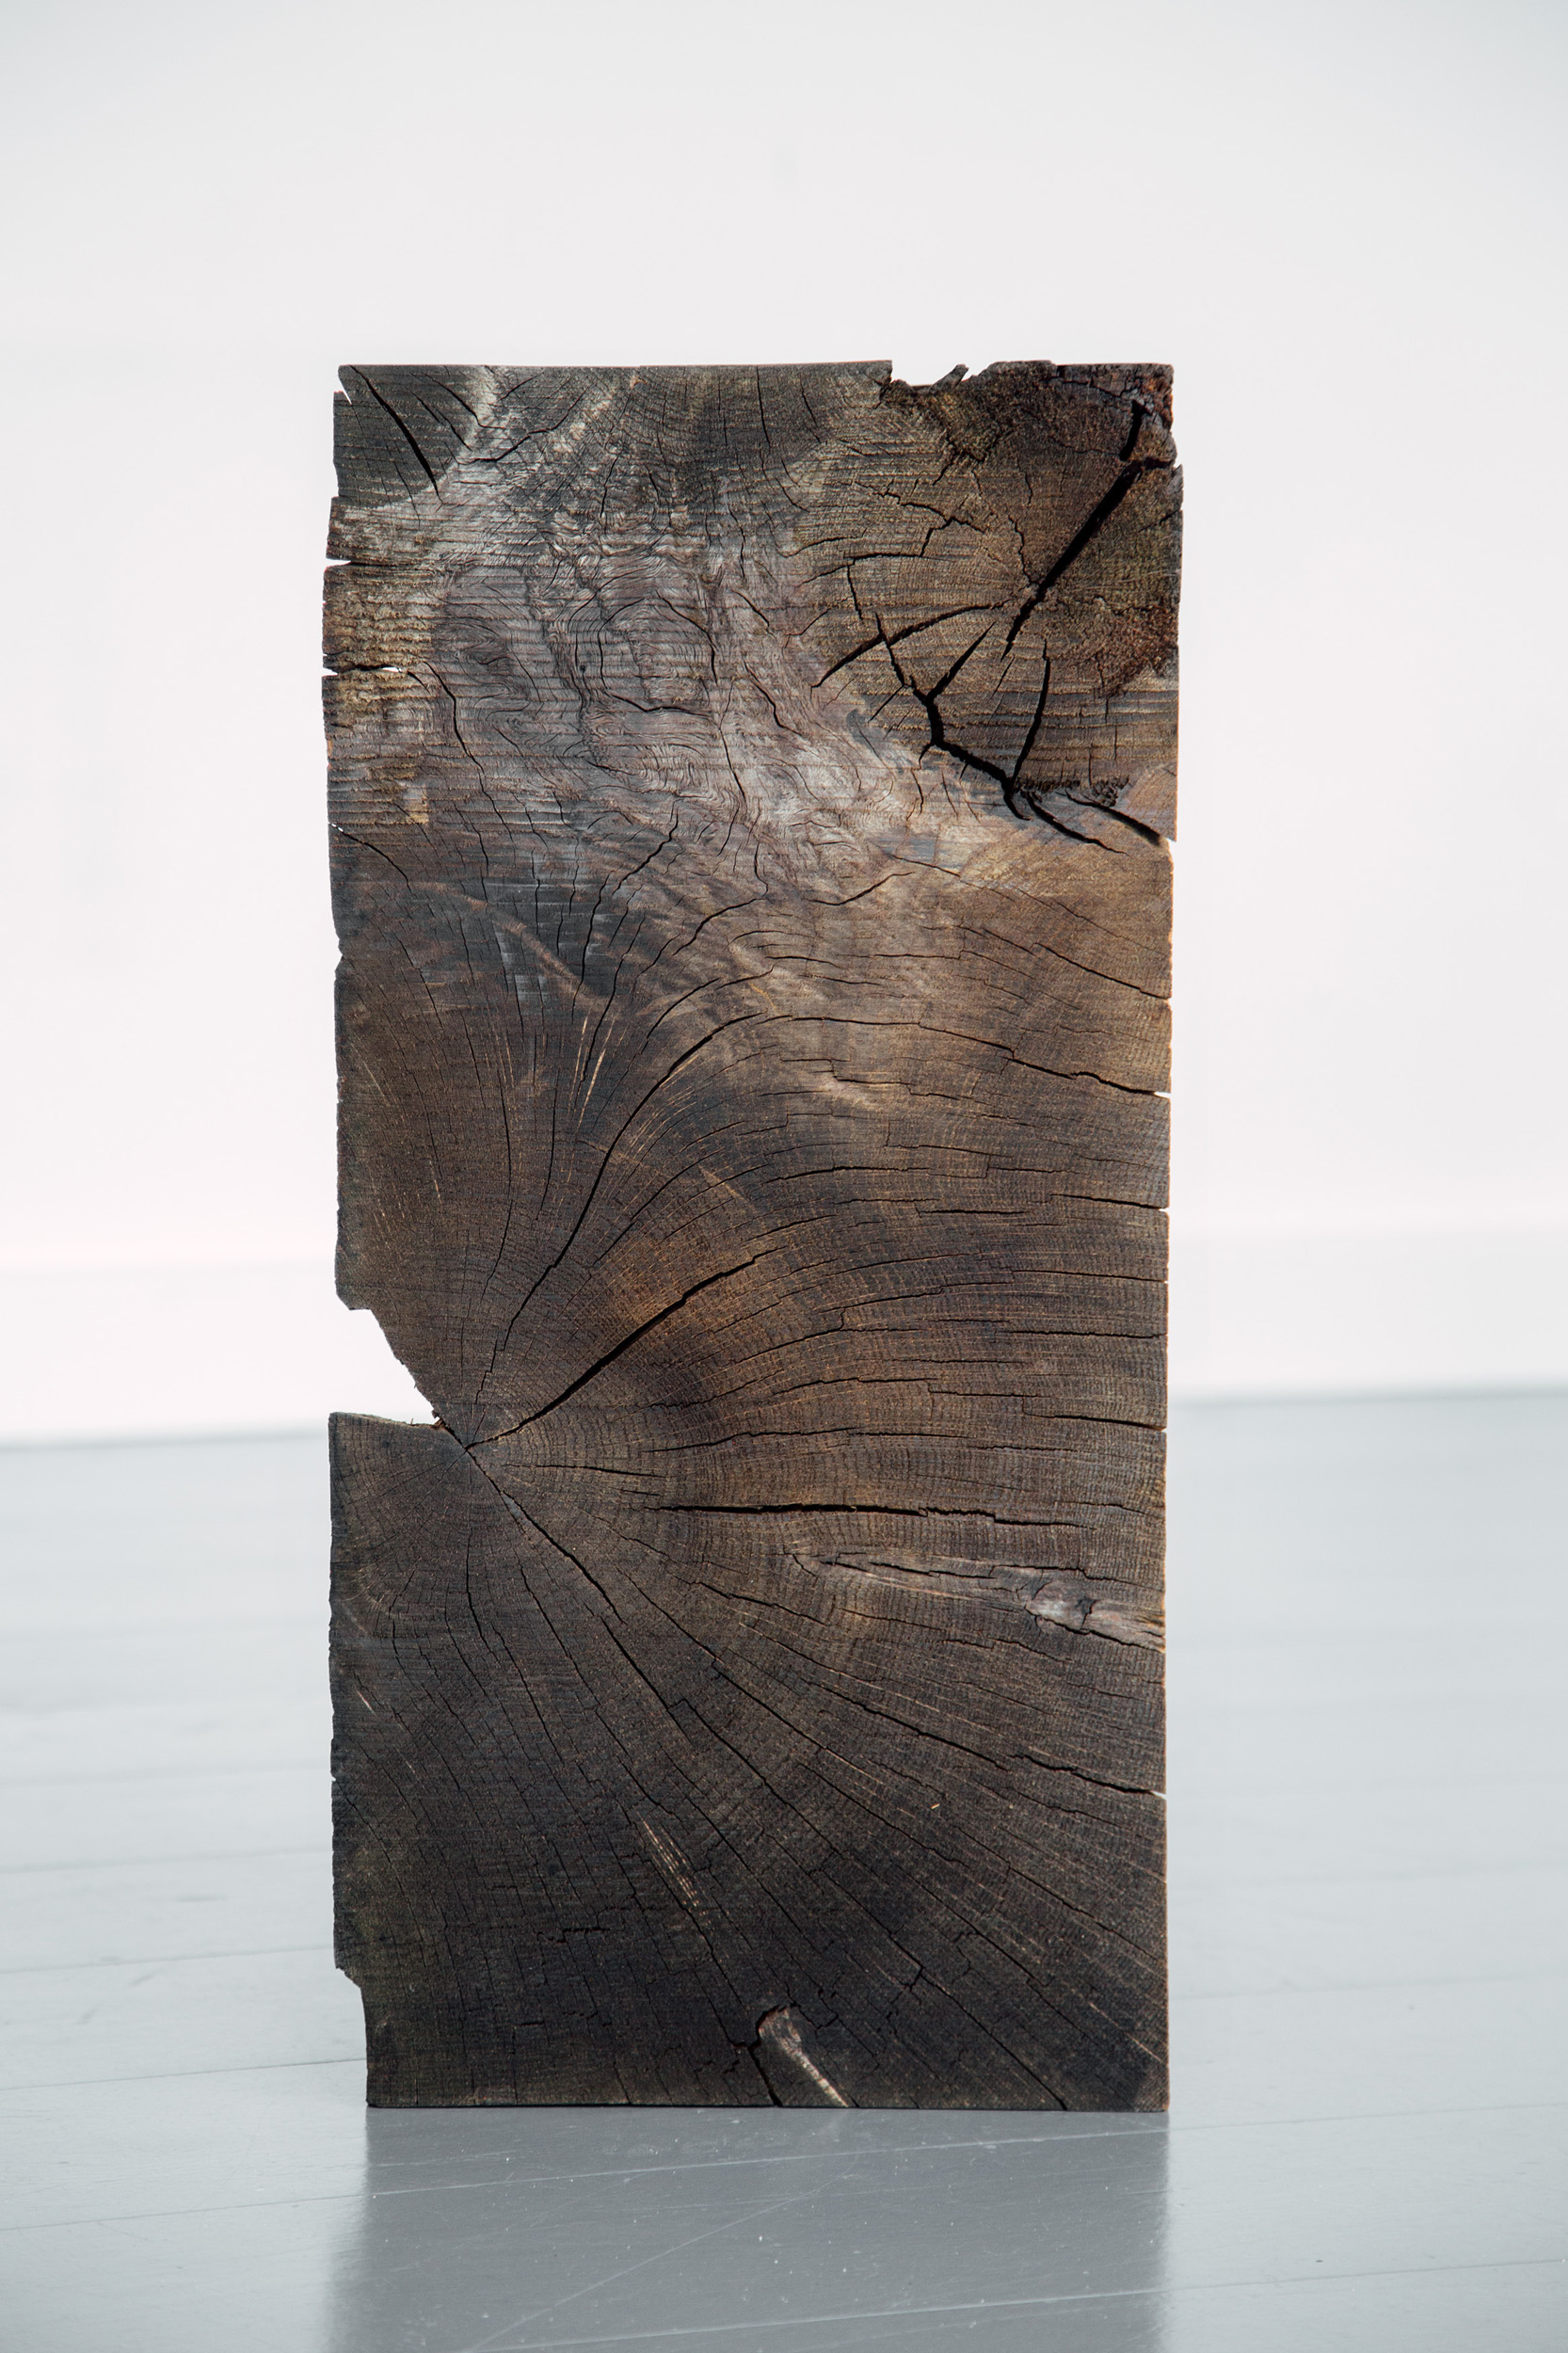 Tina Astrup - Studio portrait and photographic documentation of designer Tina Astrup's work with wood for website and exhibition PR.https://tinaastrup.com